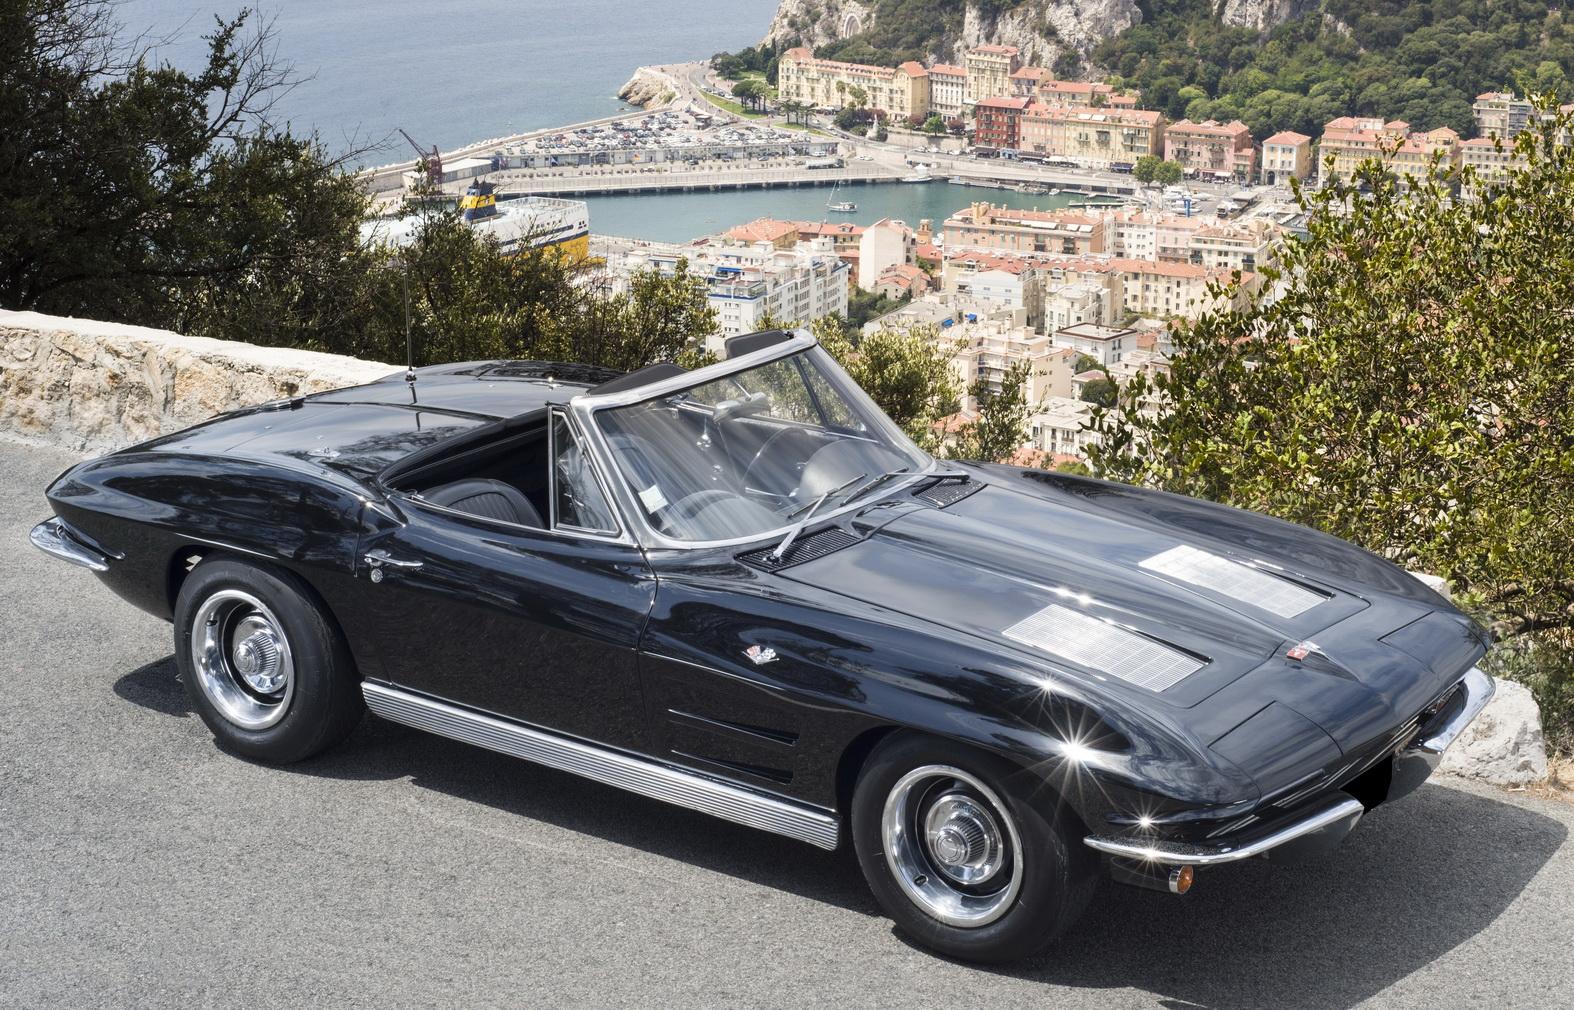 Chevrolet Corvette Sting Ray Rent A Classic Car